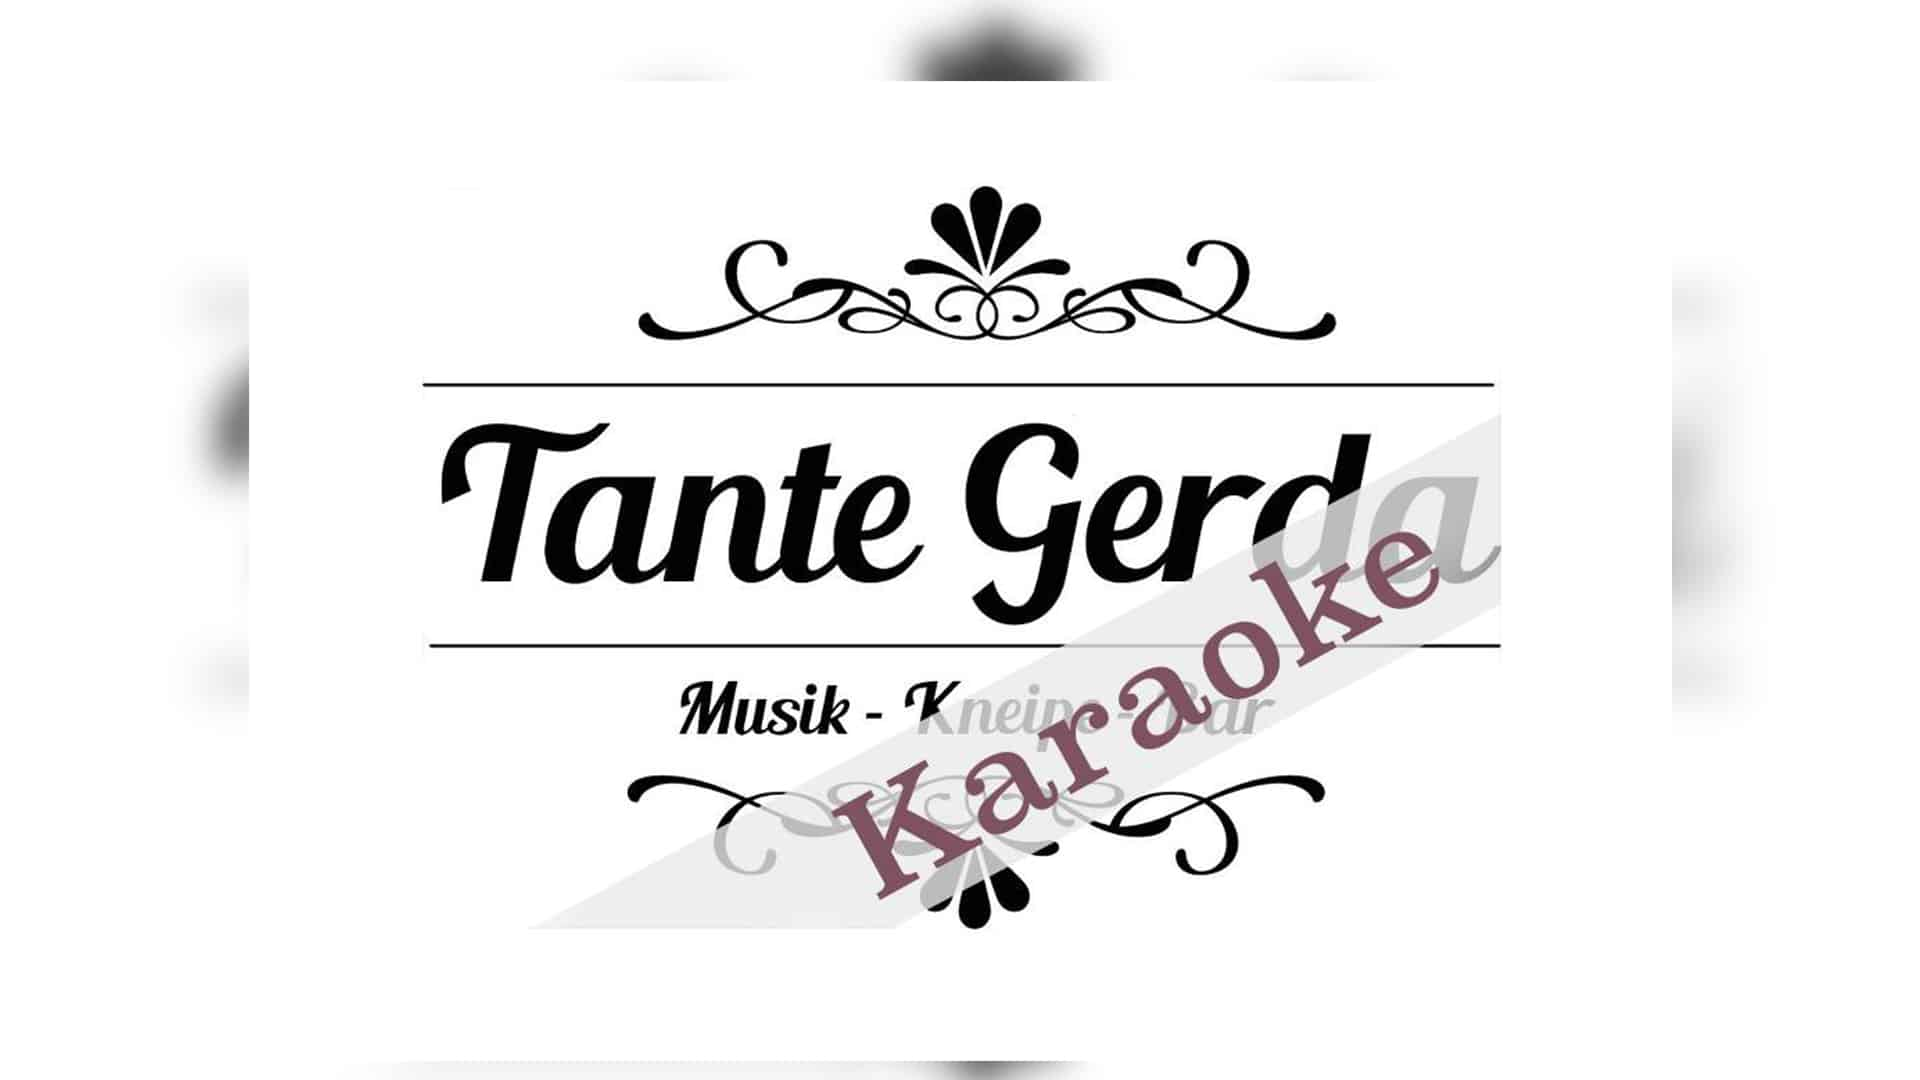 Karaoke-Abend  mit über 25.000 Songs